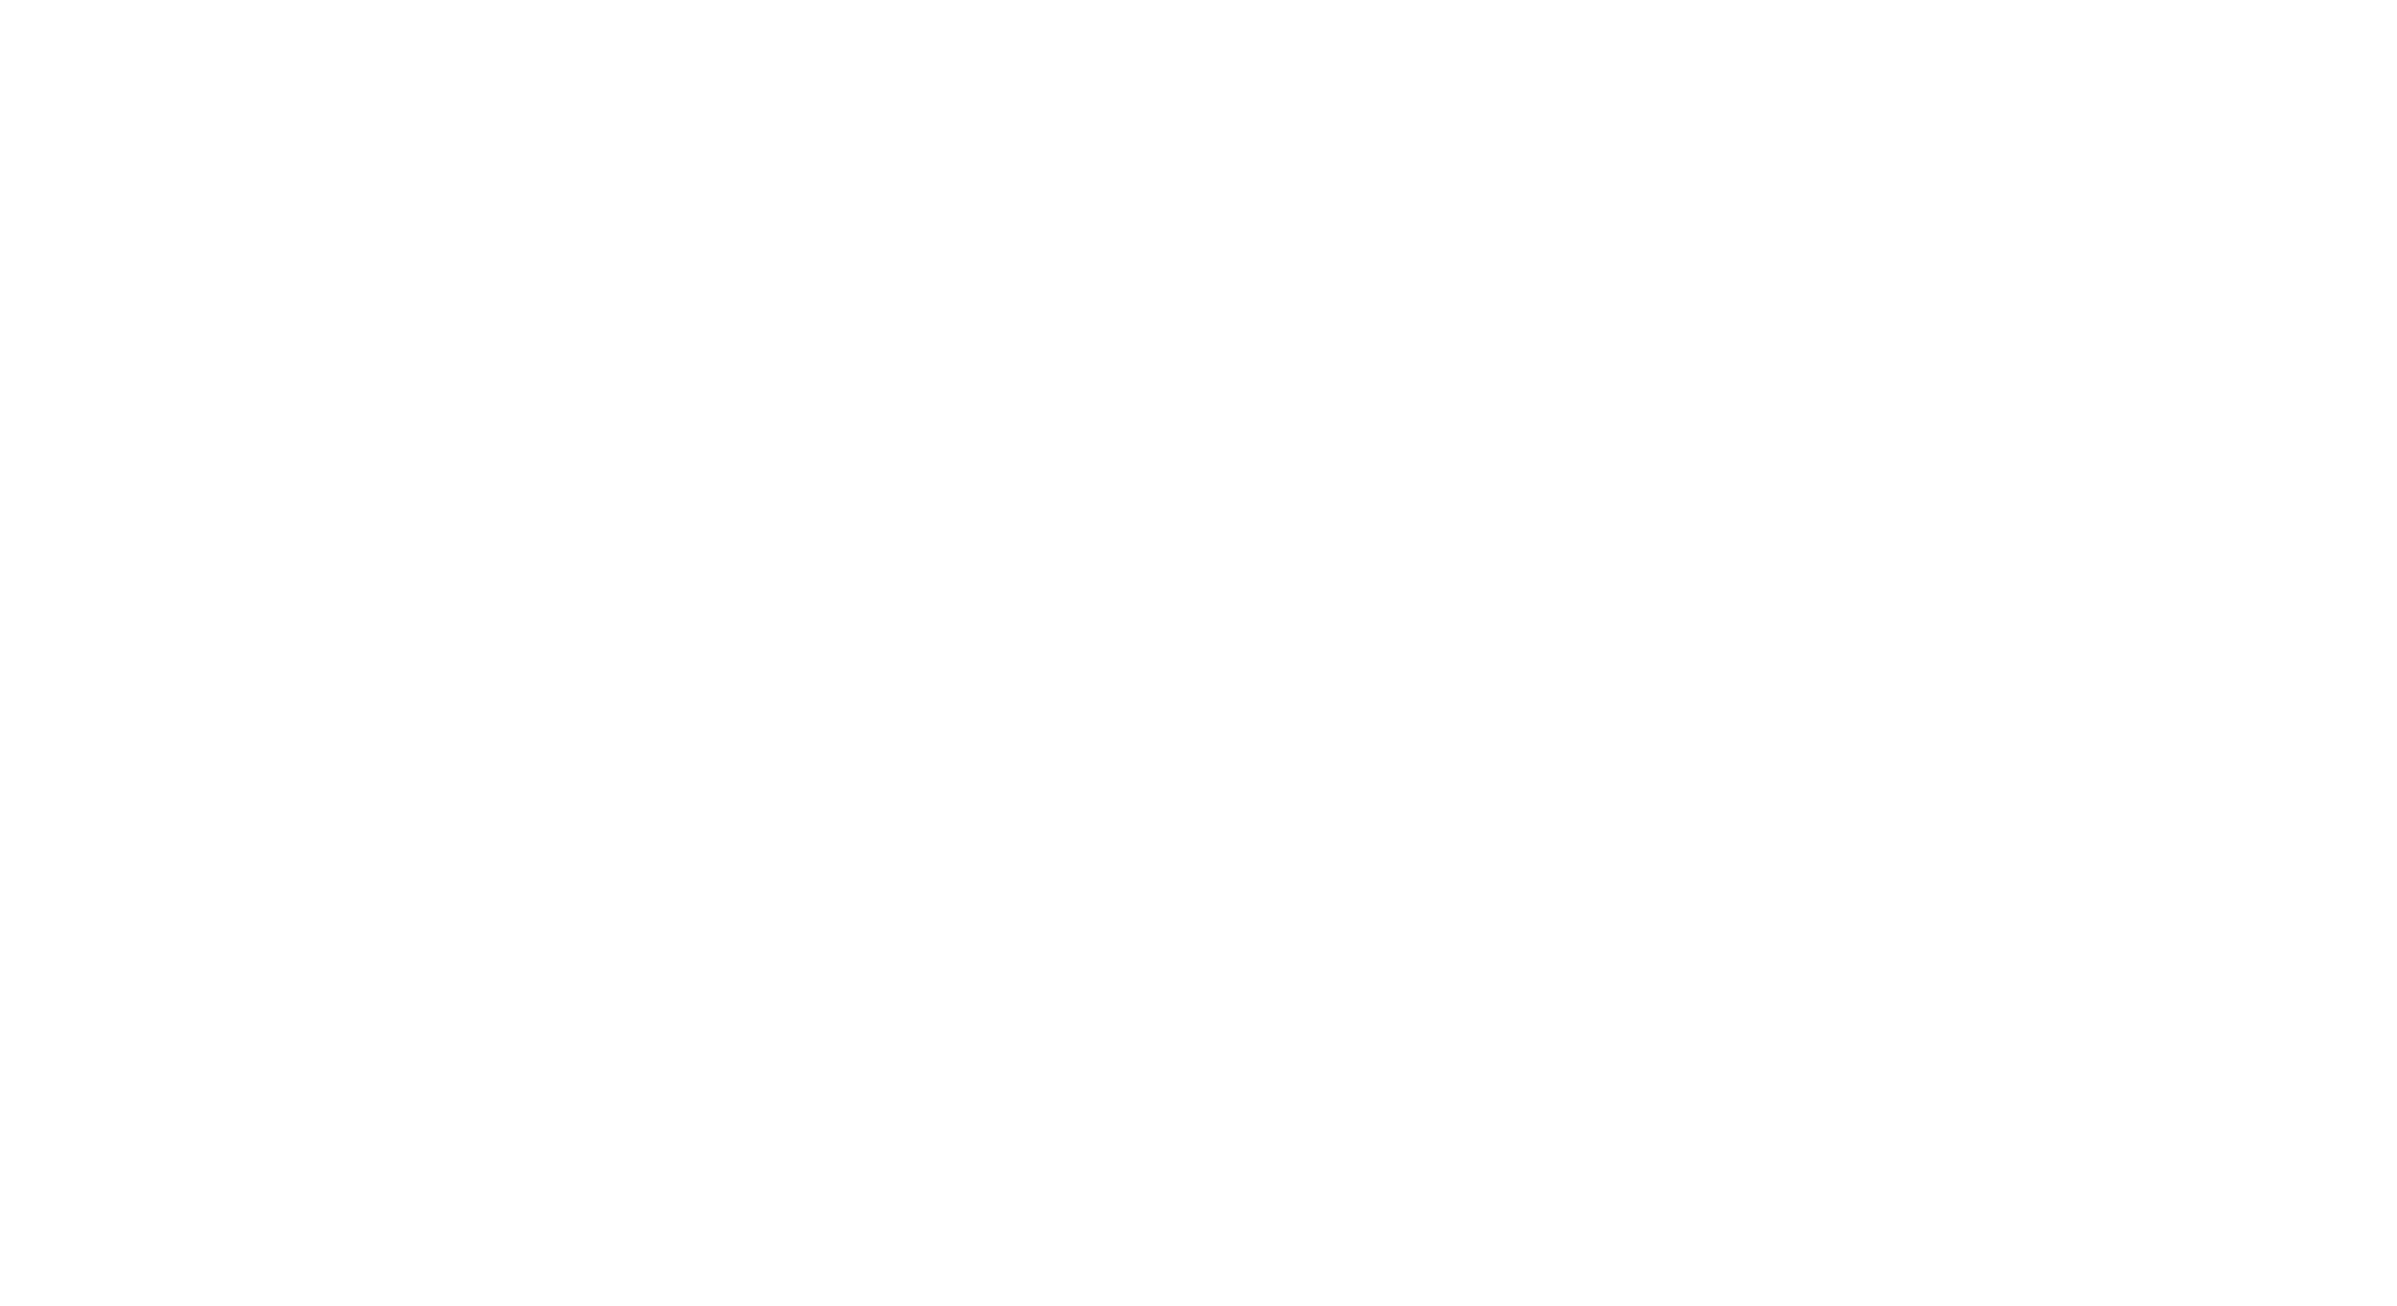 Veeam_ProPartner_Cloud&Service_Provider_Registered_main_logo